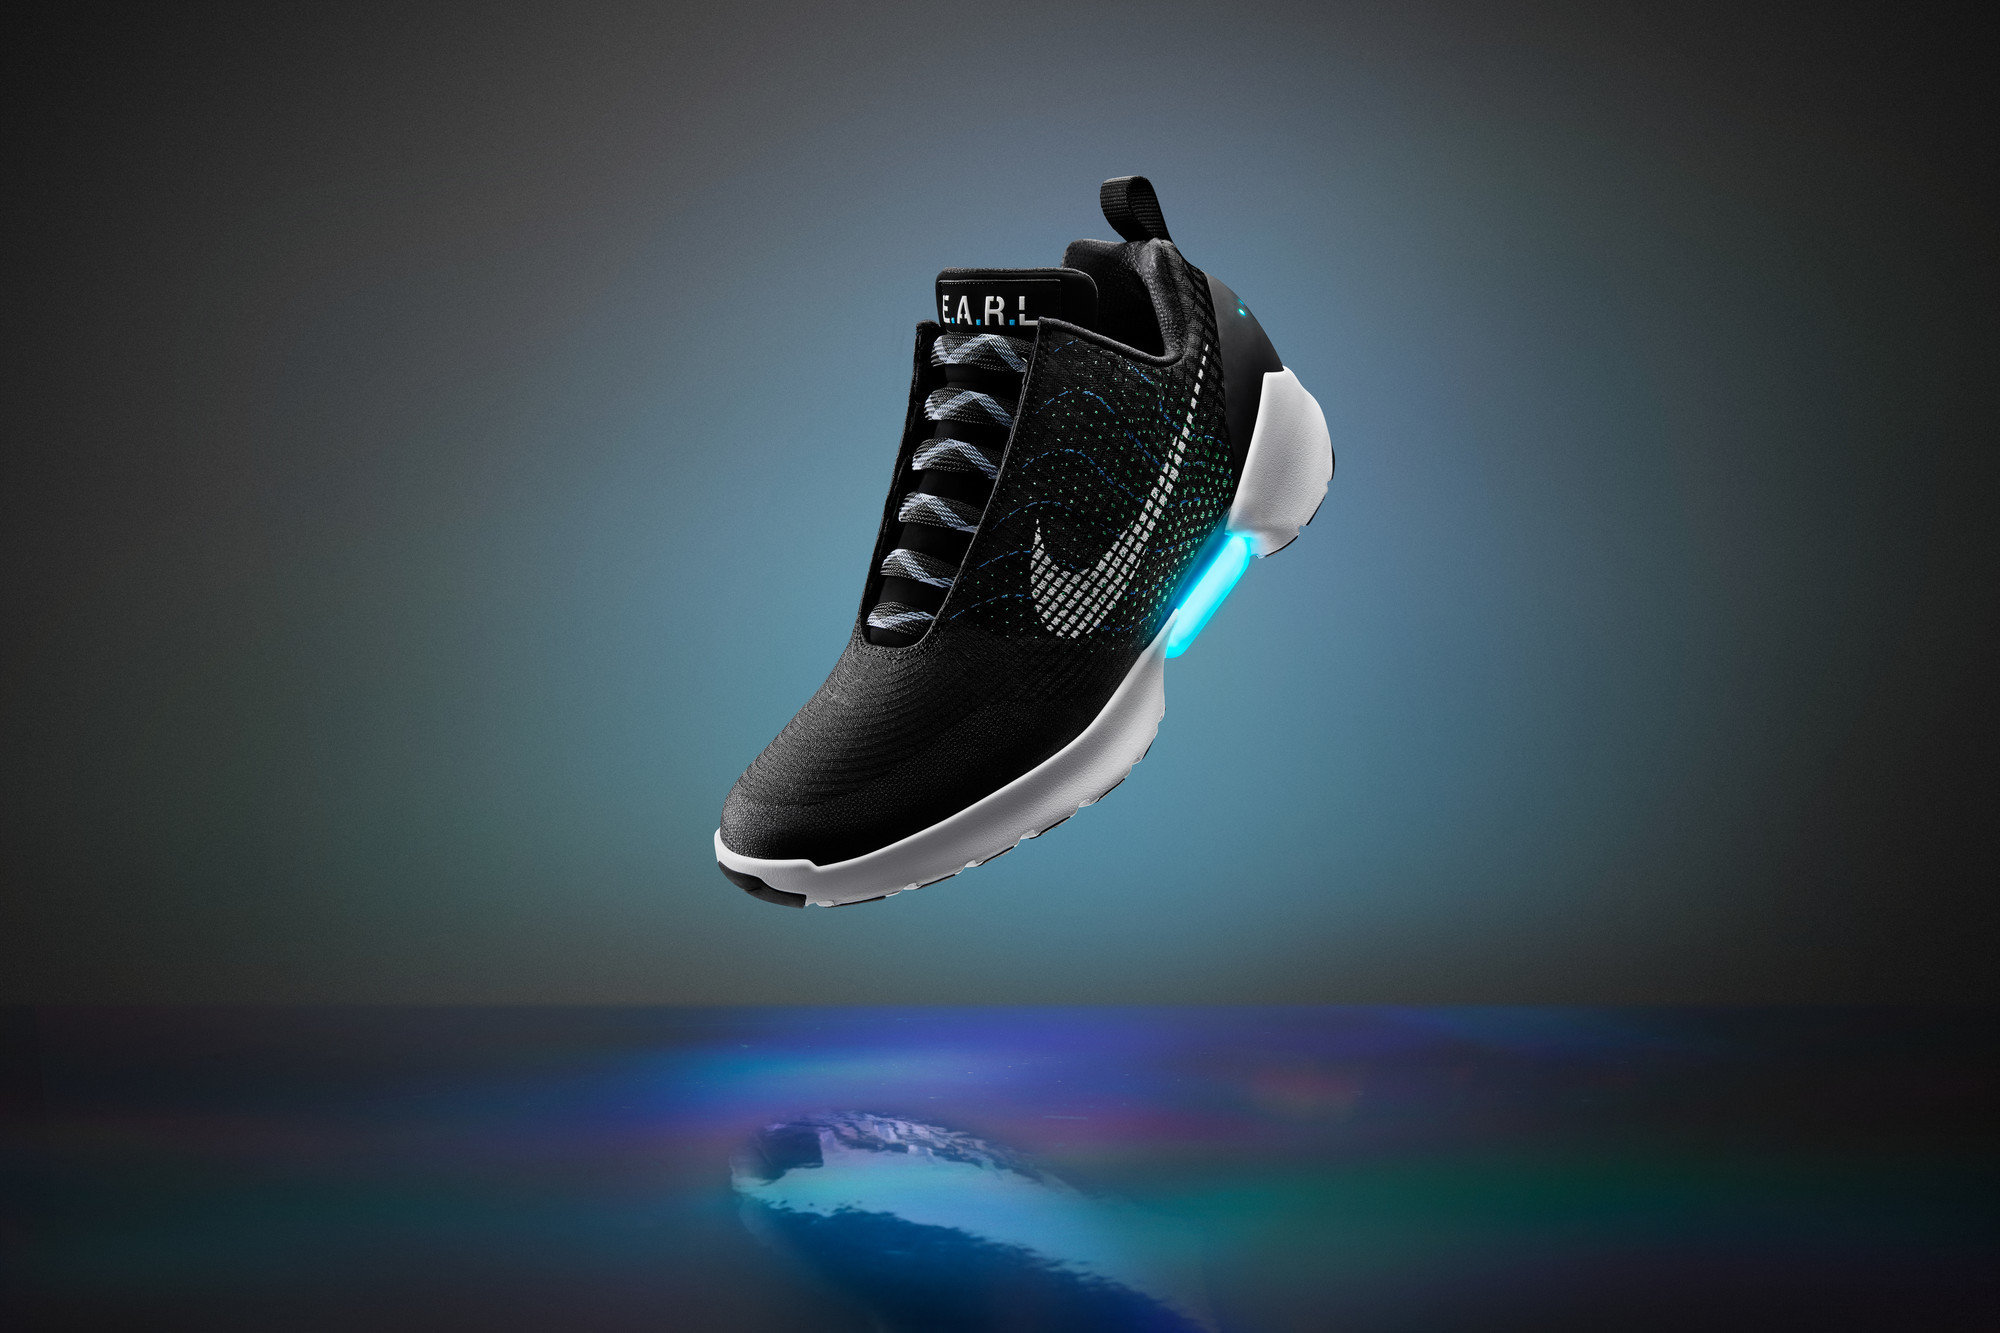 Smart shoes HyperAdapt 1.0